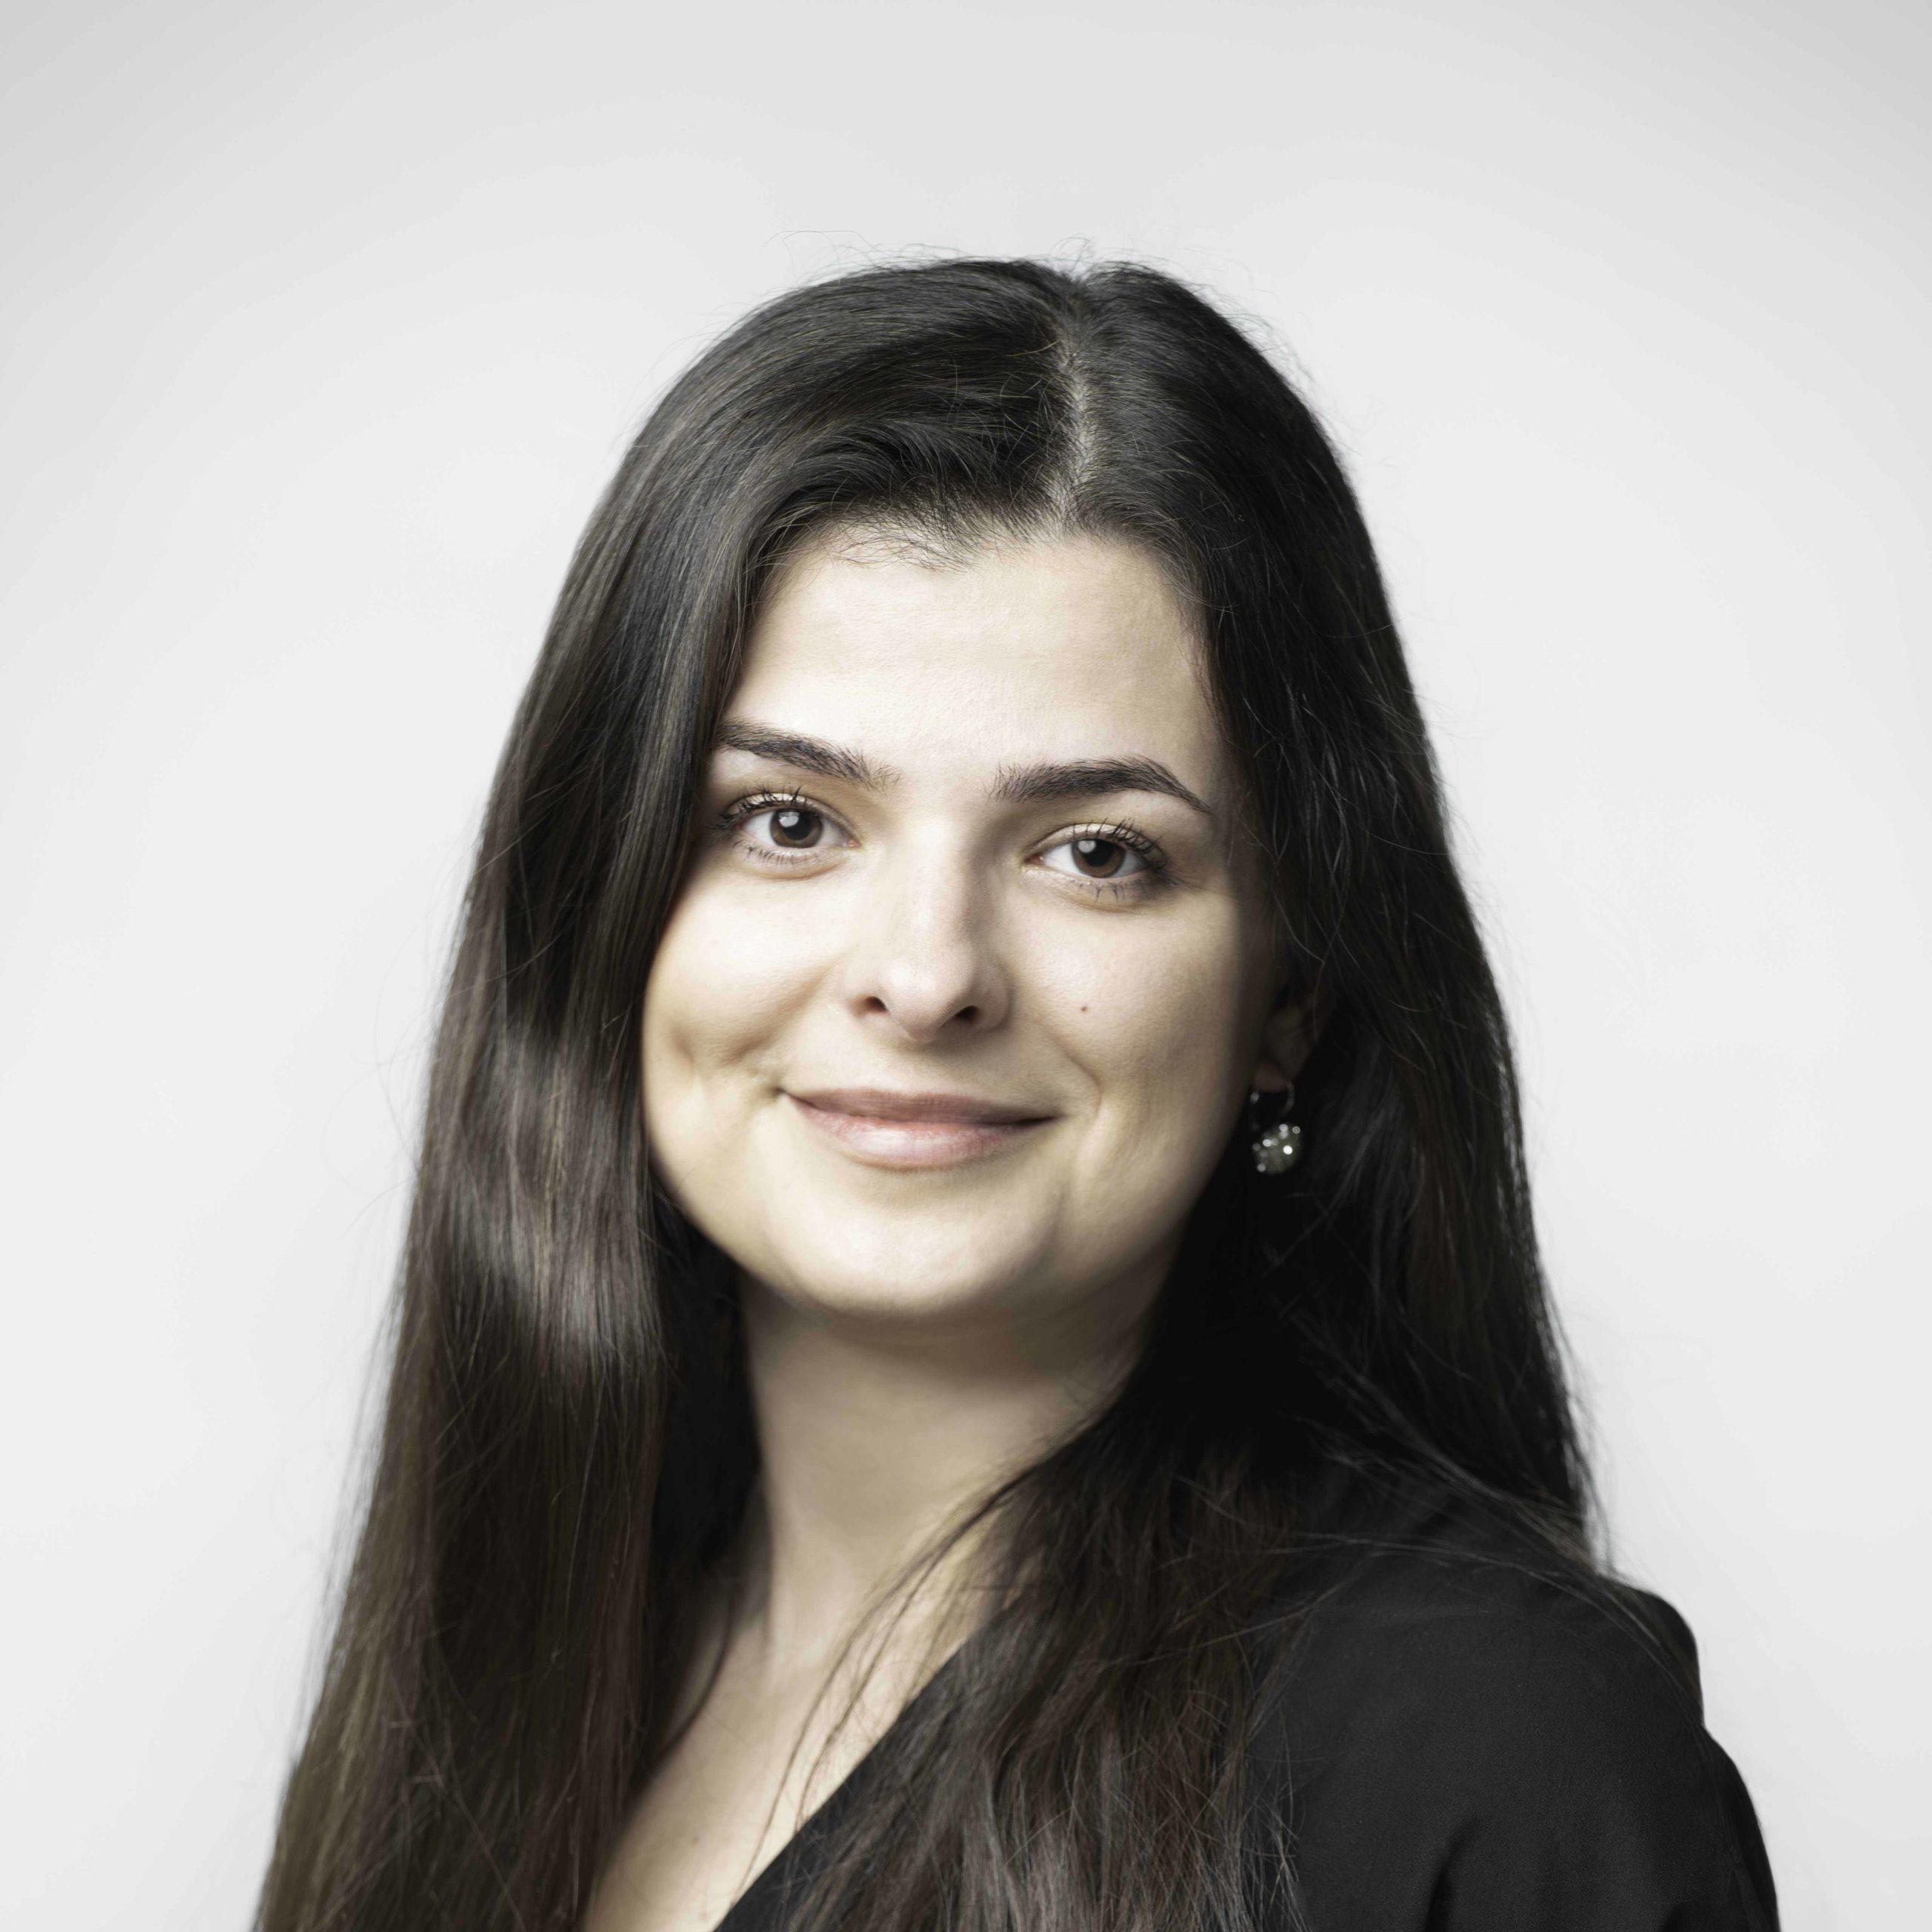 Gabriela Ligeza